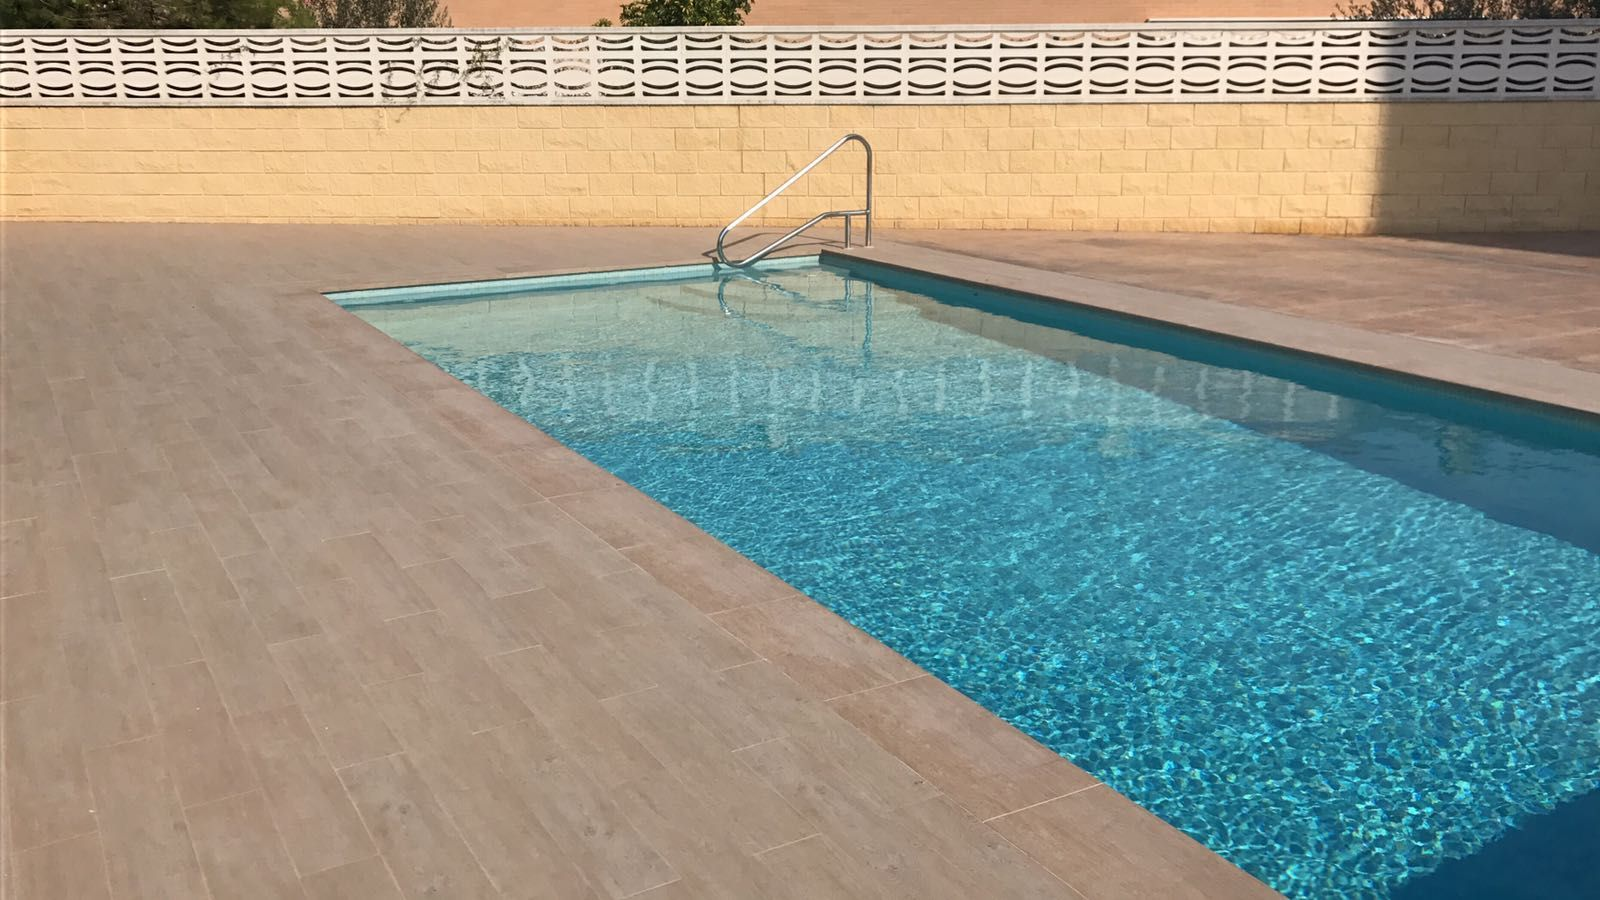 Empresa de construcci n de piscinas cambrils pavimentos y for Empresas de construccion de piscinas